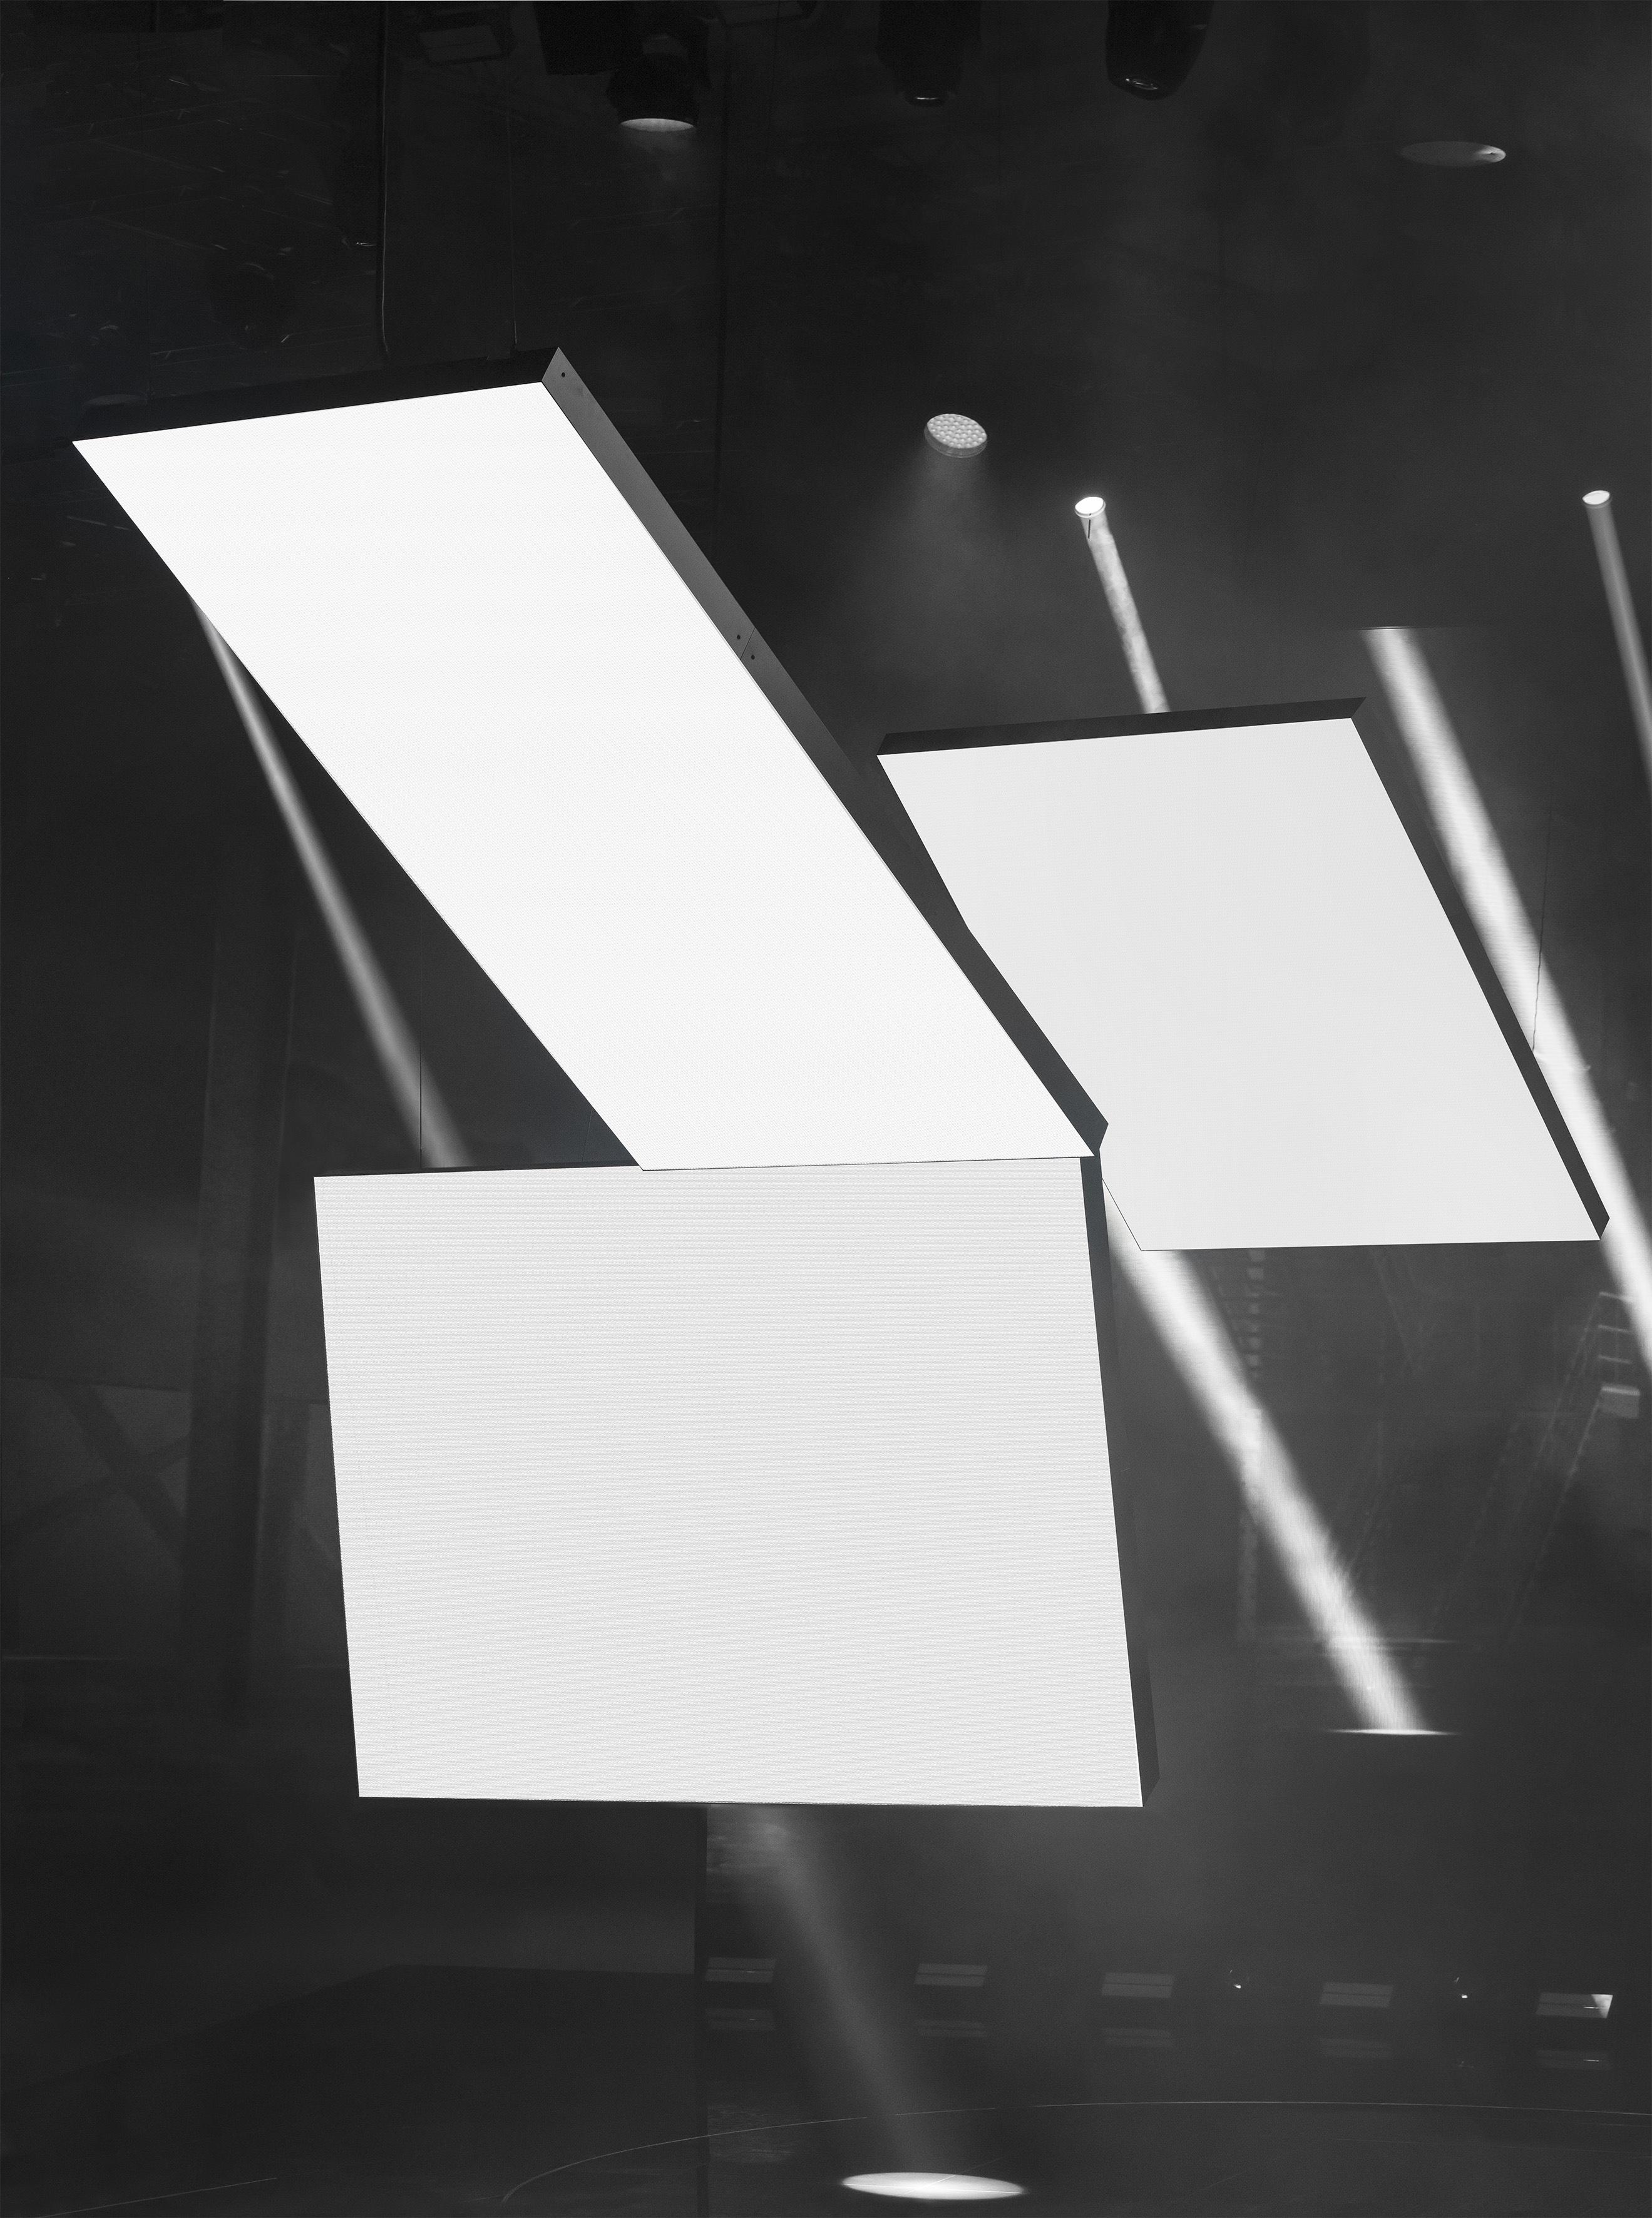 Alexander Romey, 17000 dots:m2_170x122 cm_2020_Pigmentdruck